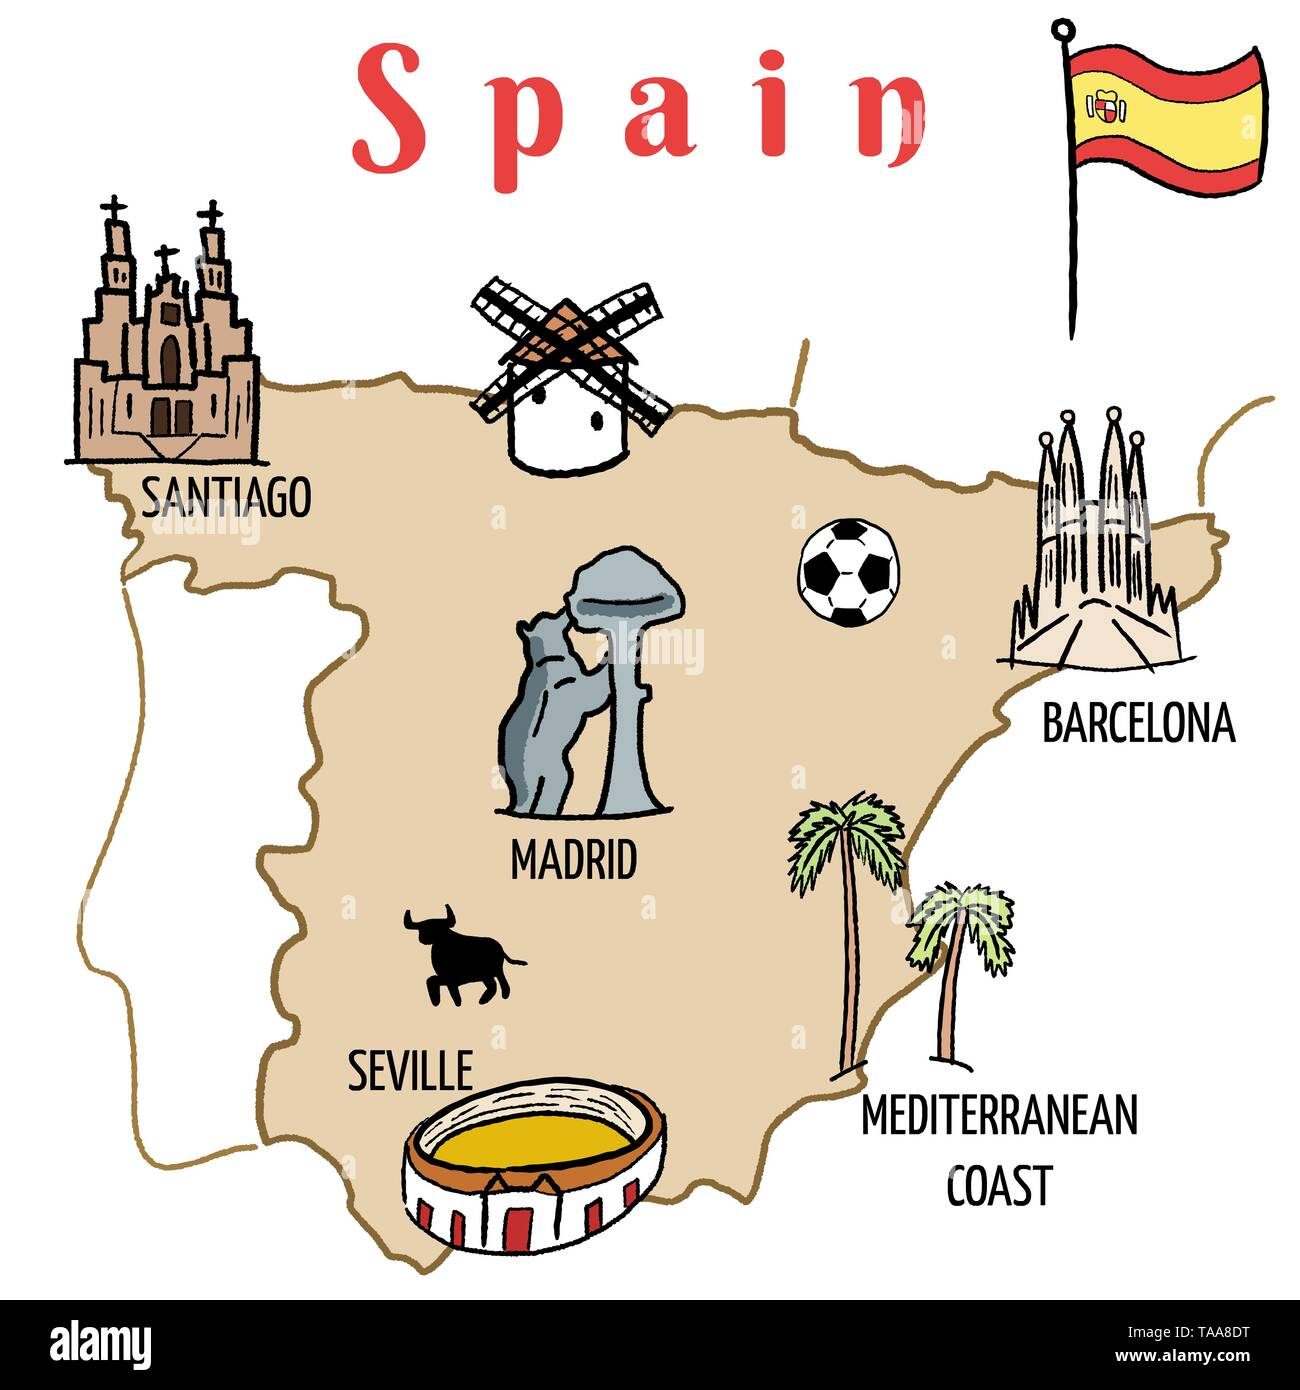 Map Of Spain Landmarks.Spain Landmarks Map Cute Doodle Vector Graphics With Madrid